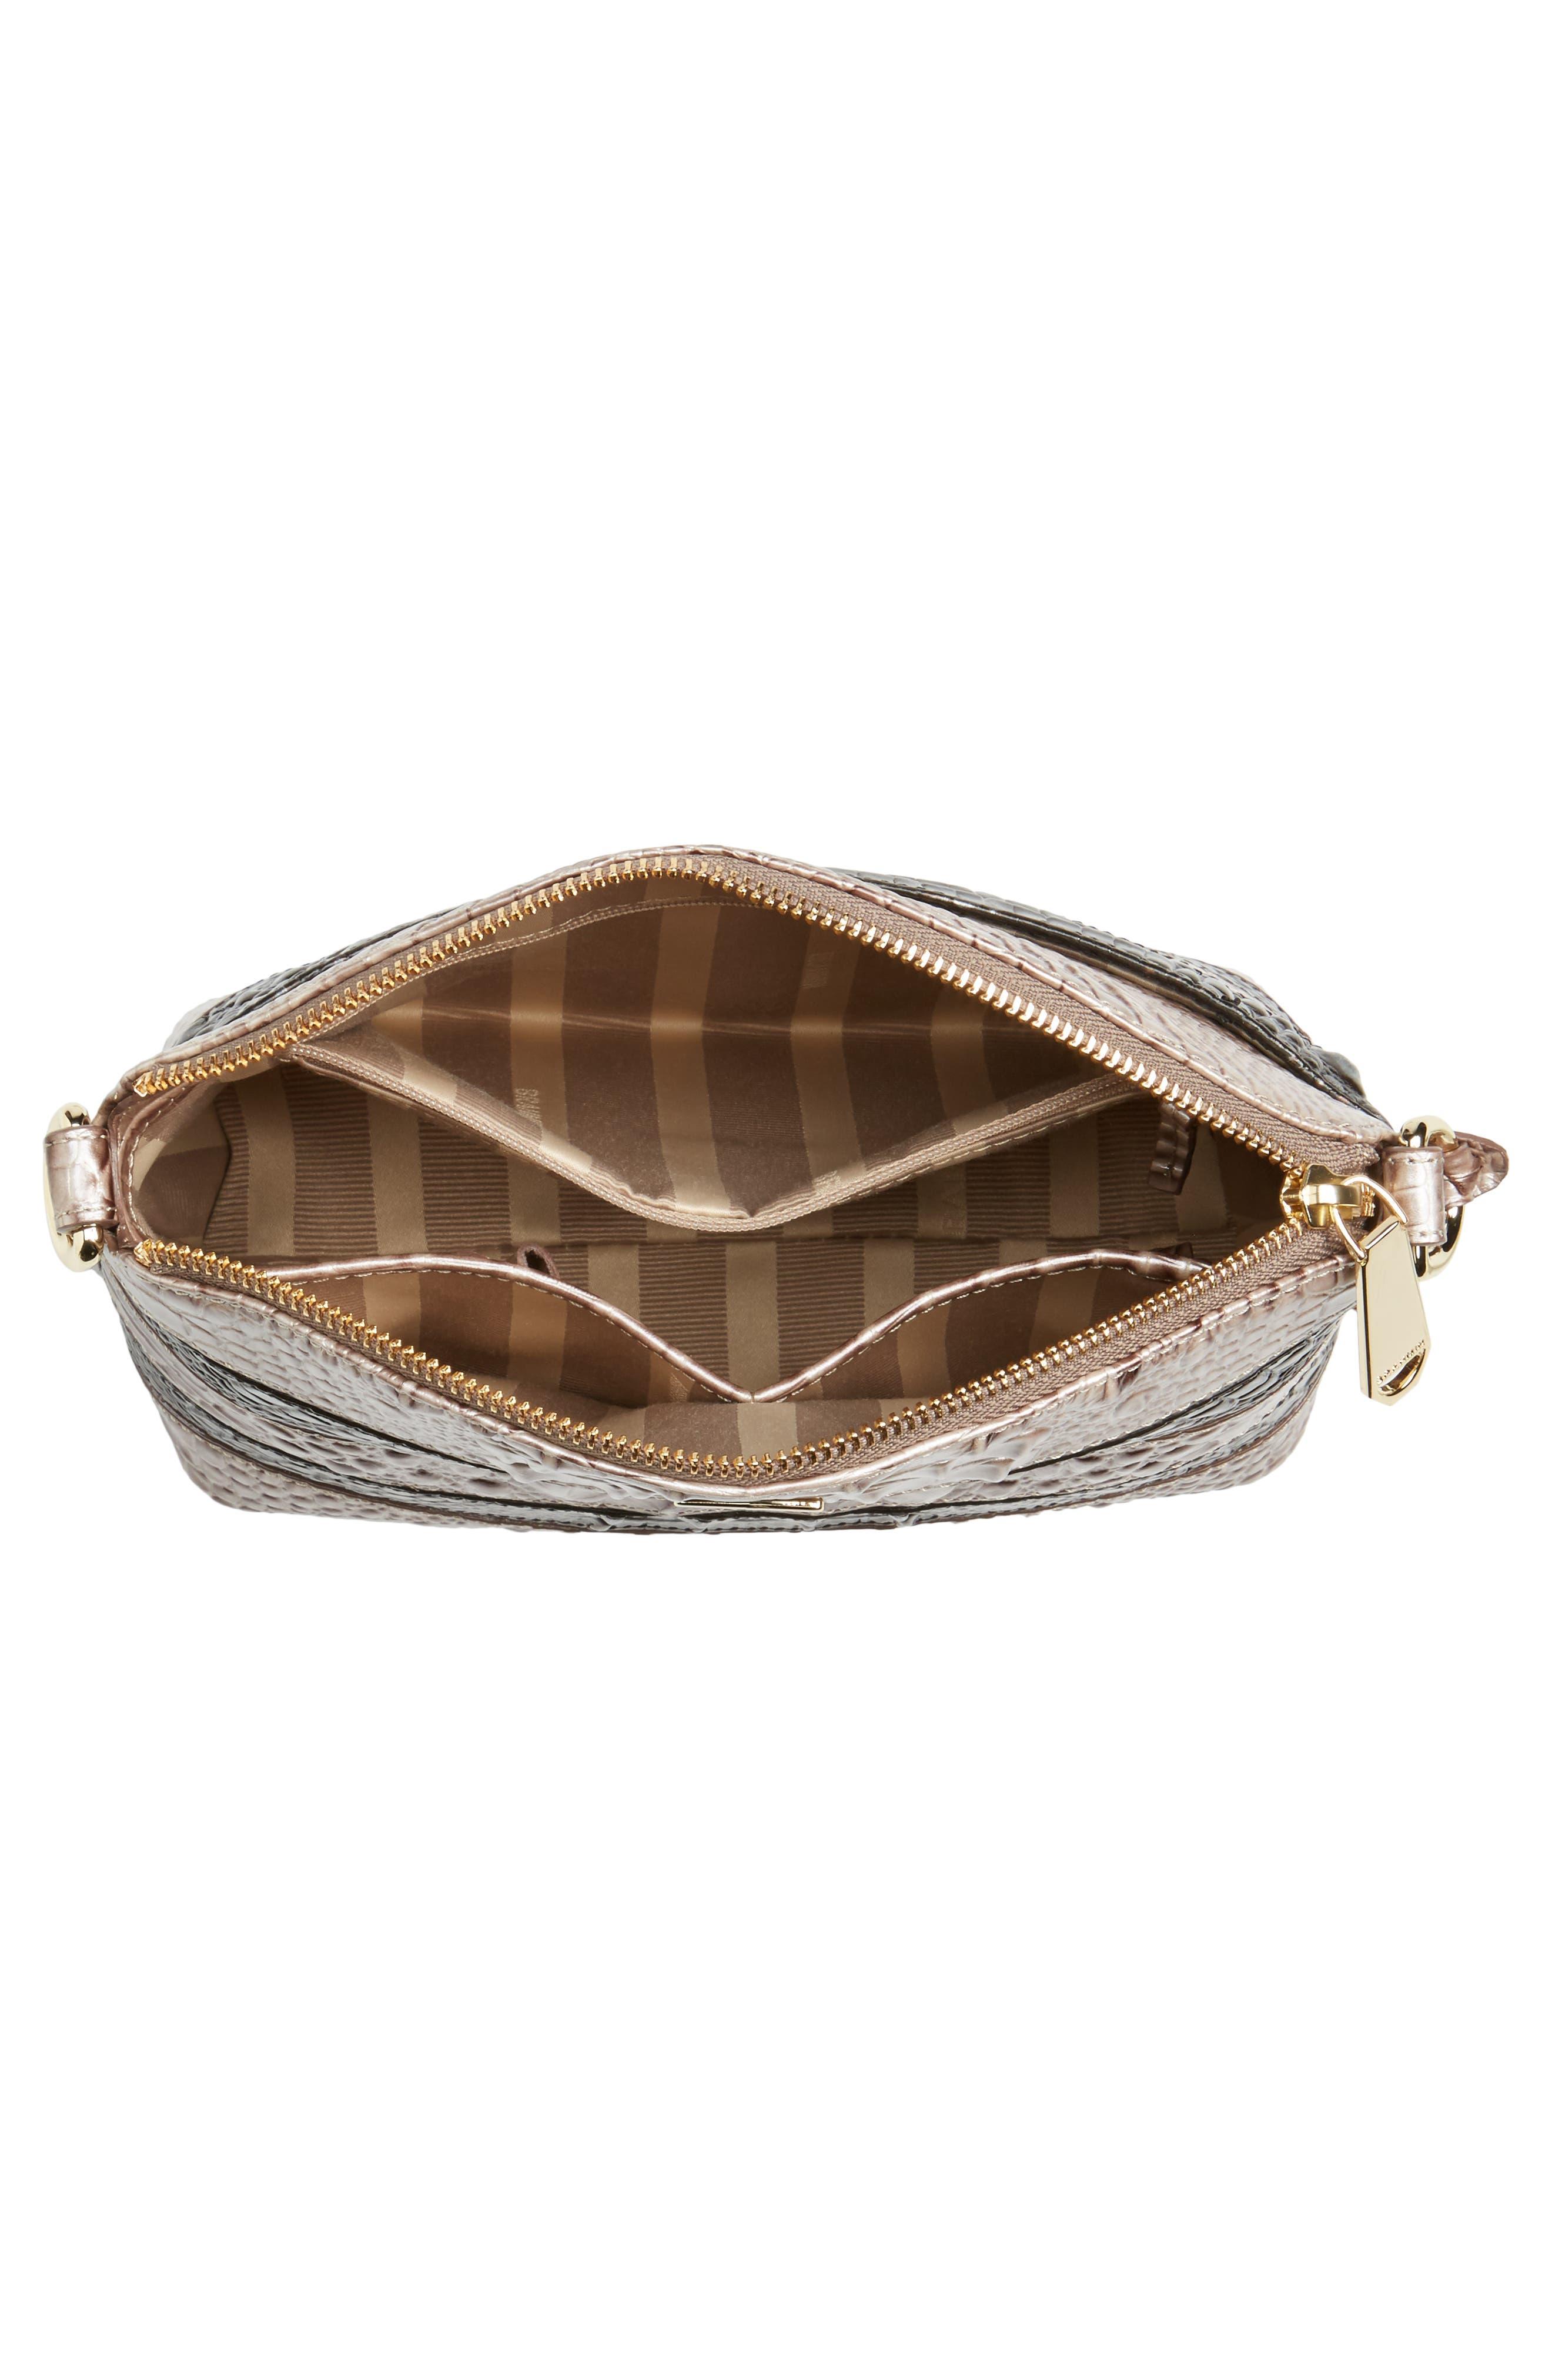 Mini Duxbury Leather Crossbody Bag,                             Alternate thumbnail 4, color,                             Chardonnay